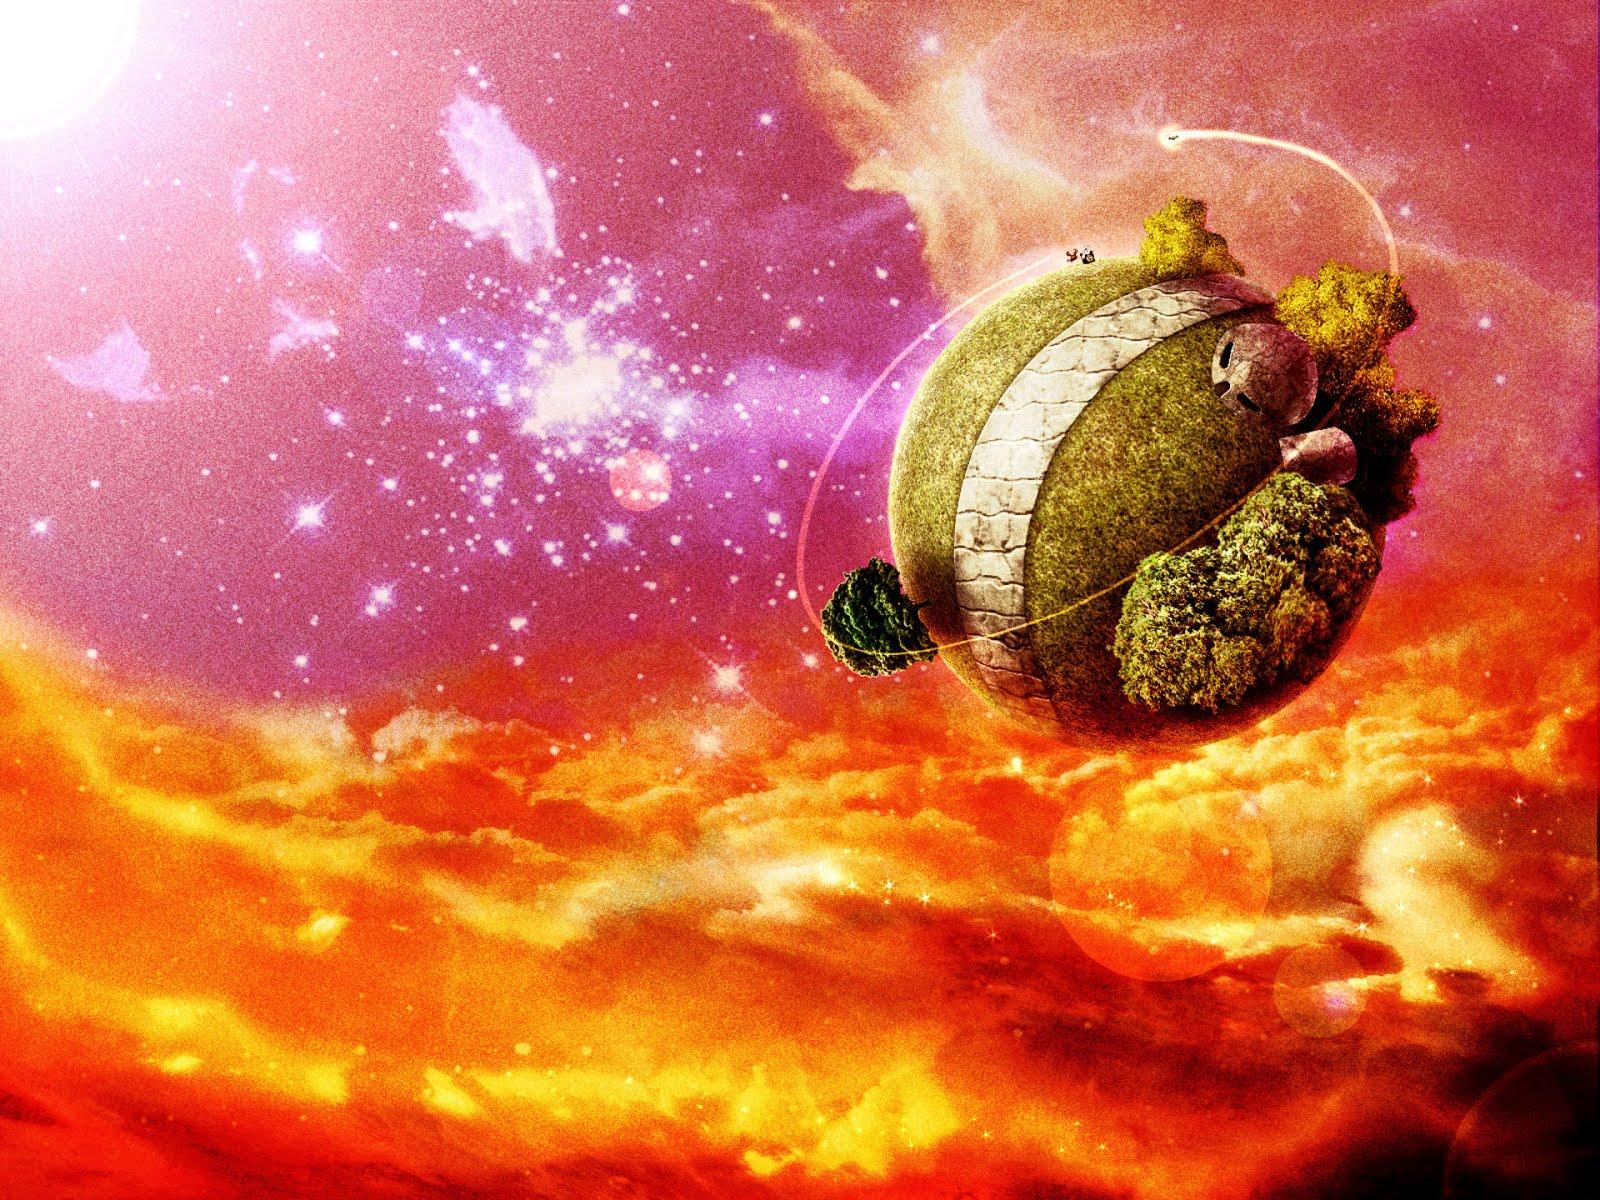 http://1.bp.blogspot.com/-dfpDfn_XPEM/UJfquOT_LlI/AAAAAAAABCU/ax9faABpiI0/s1600/dragonball%2Bz%2Bwallpaper.jpg